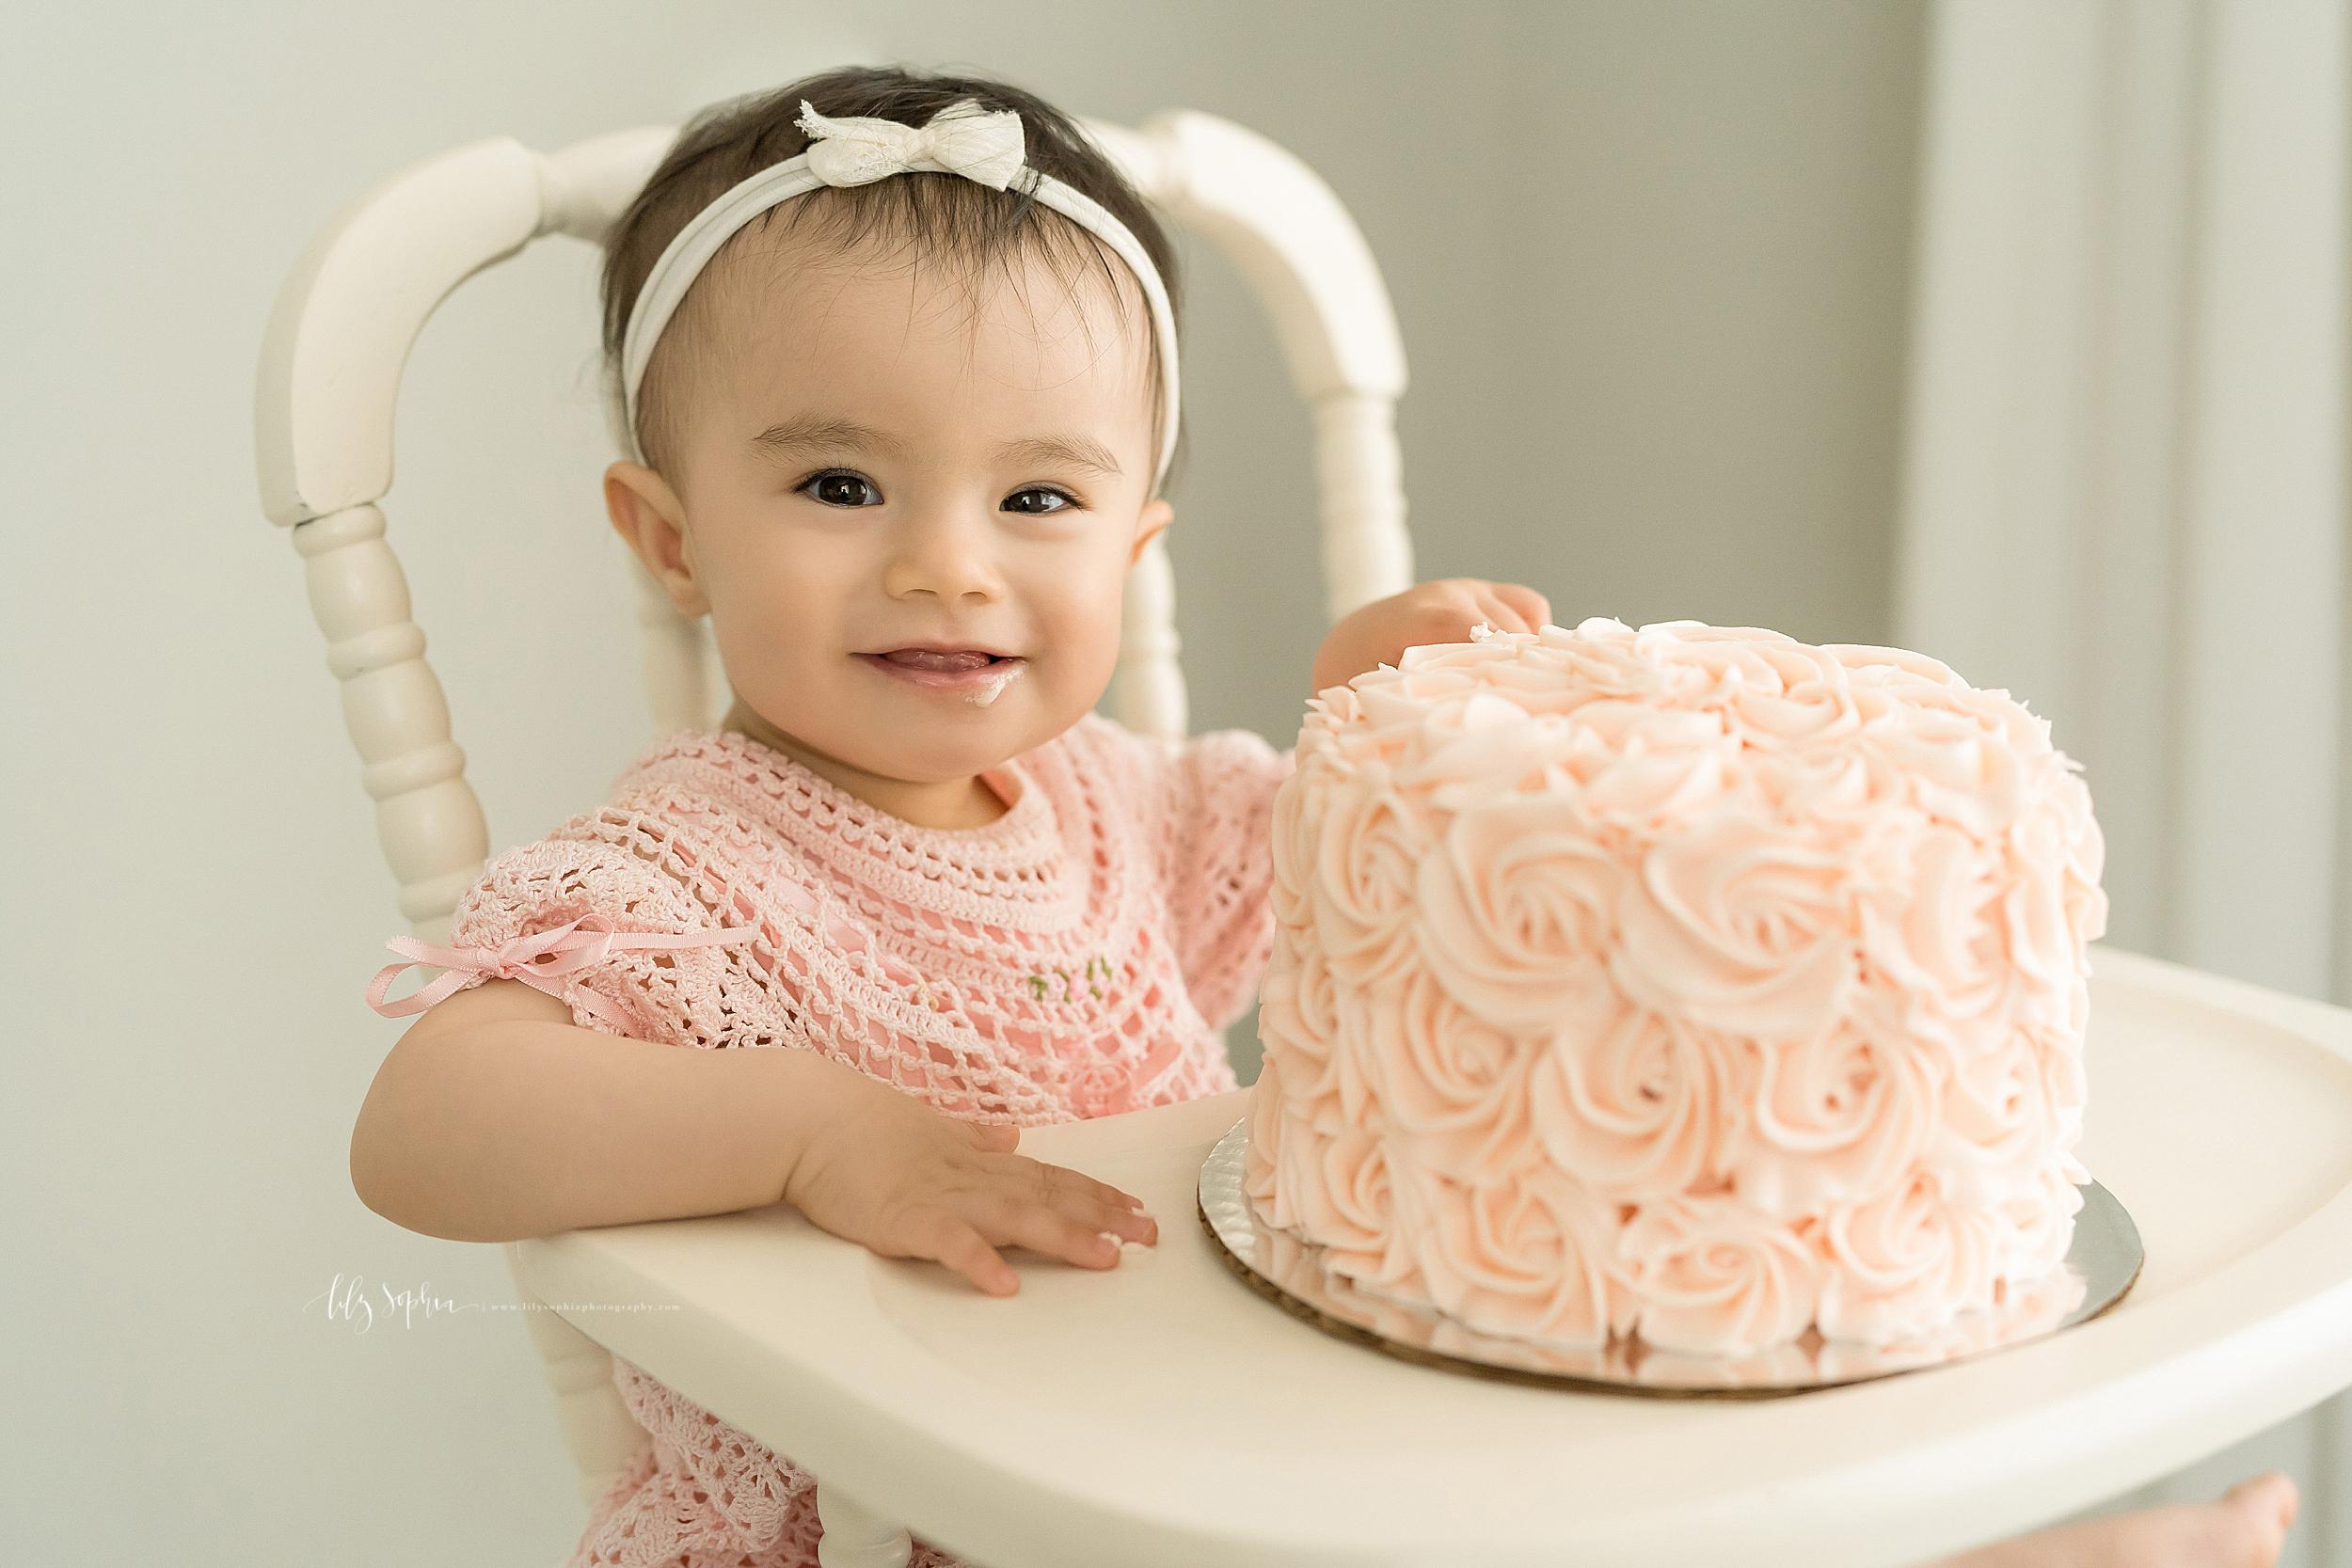 atlanta-sandy-springs-brookhaven-virginia-highlands-smyrna-decatur-lily-sophia-photography-milestone-first-birthday-toddler-girl-family-atlanta-cake-smash_0874.jpg